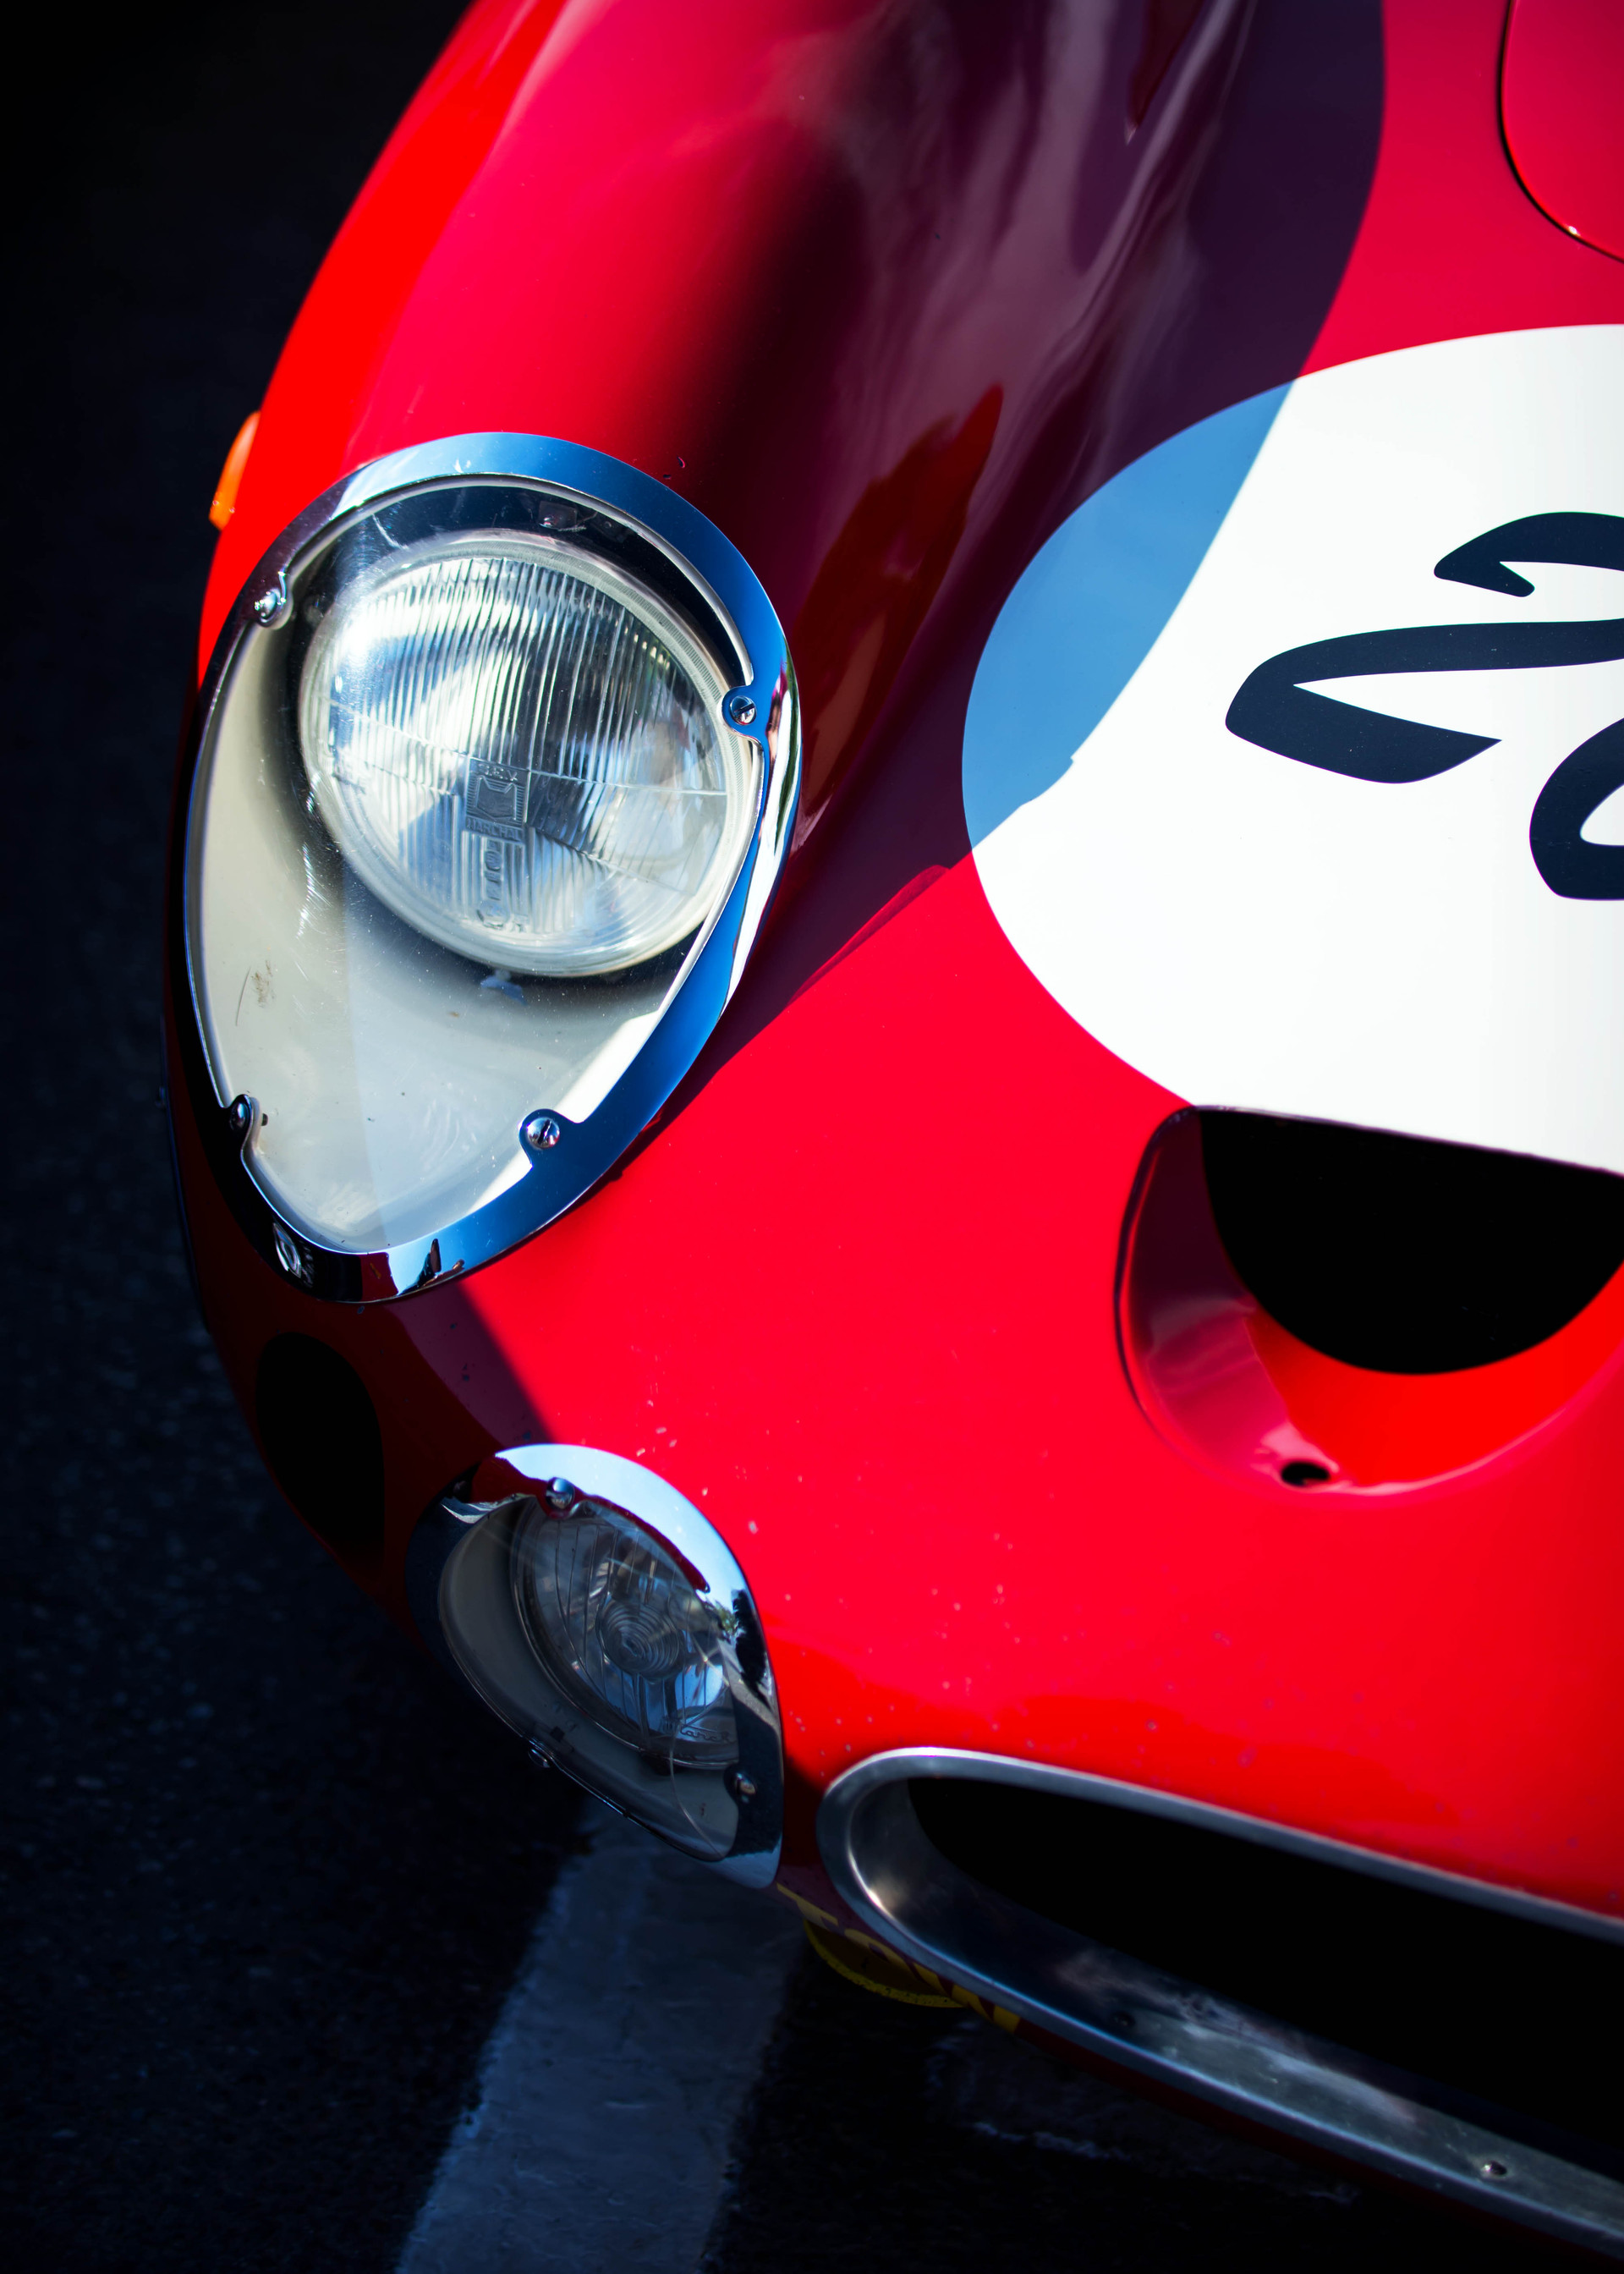 Lukas Hueni & Carlo Voegele's 1963 Ferrari 330 GTO